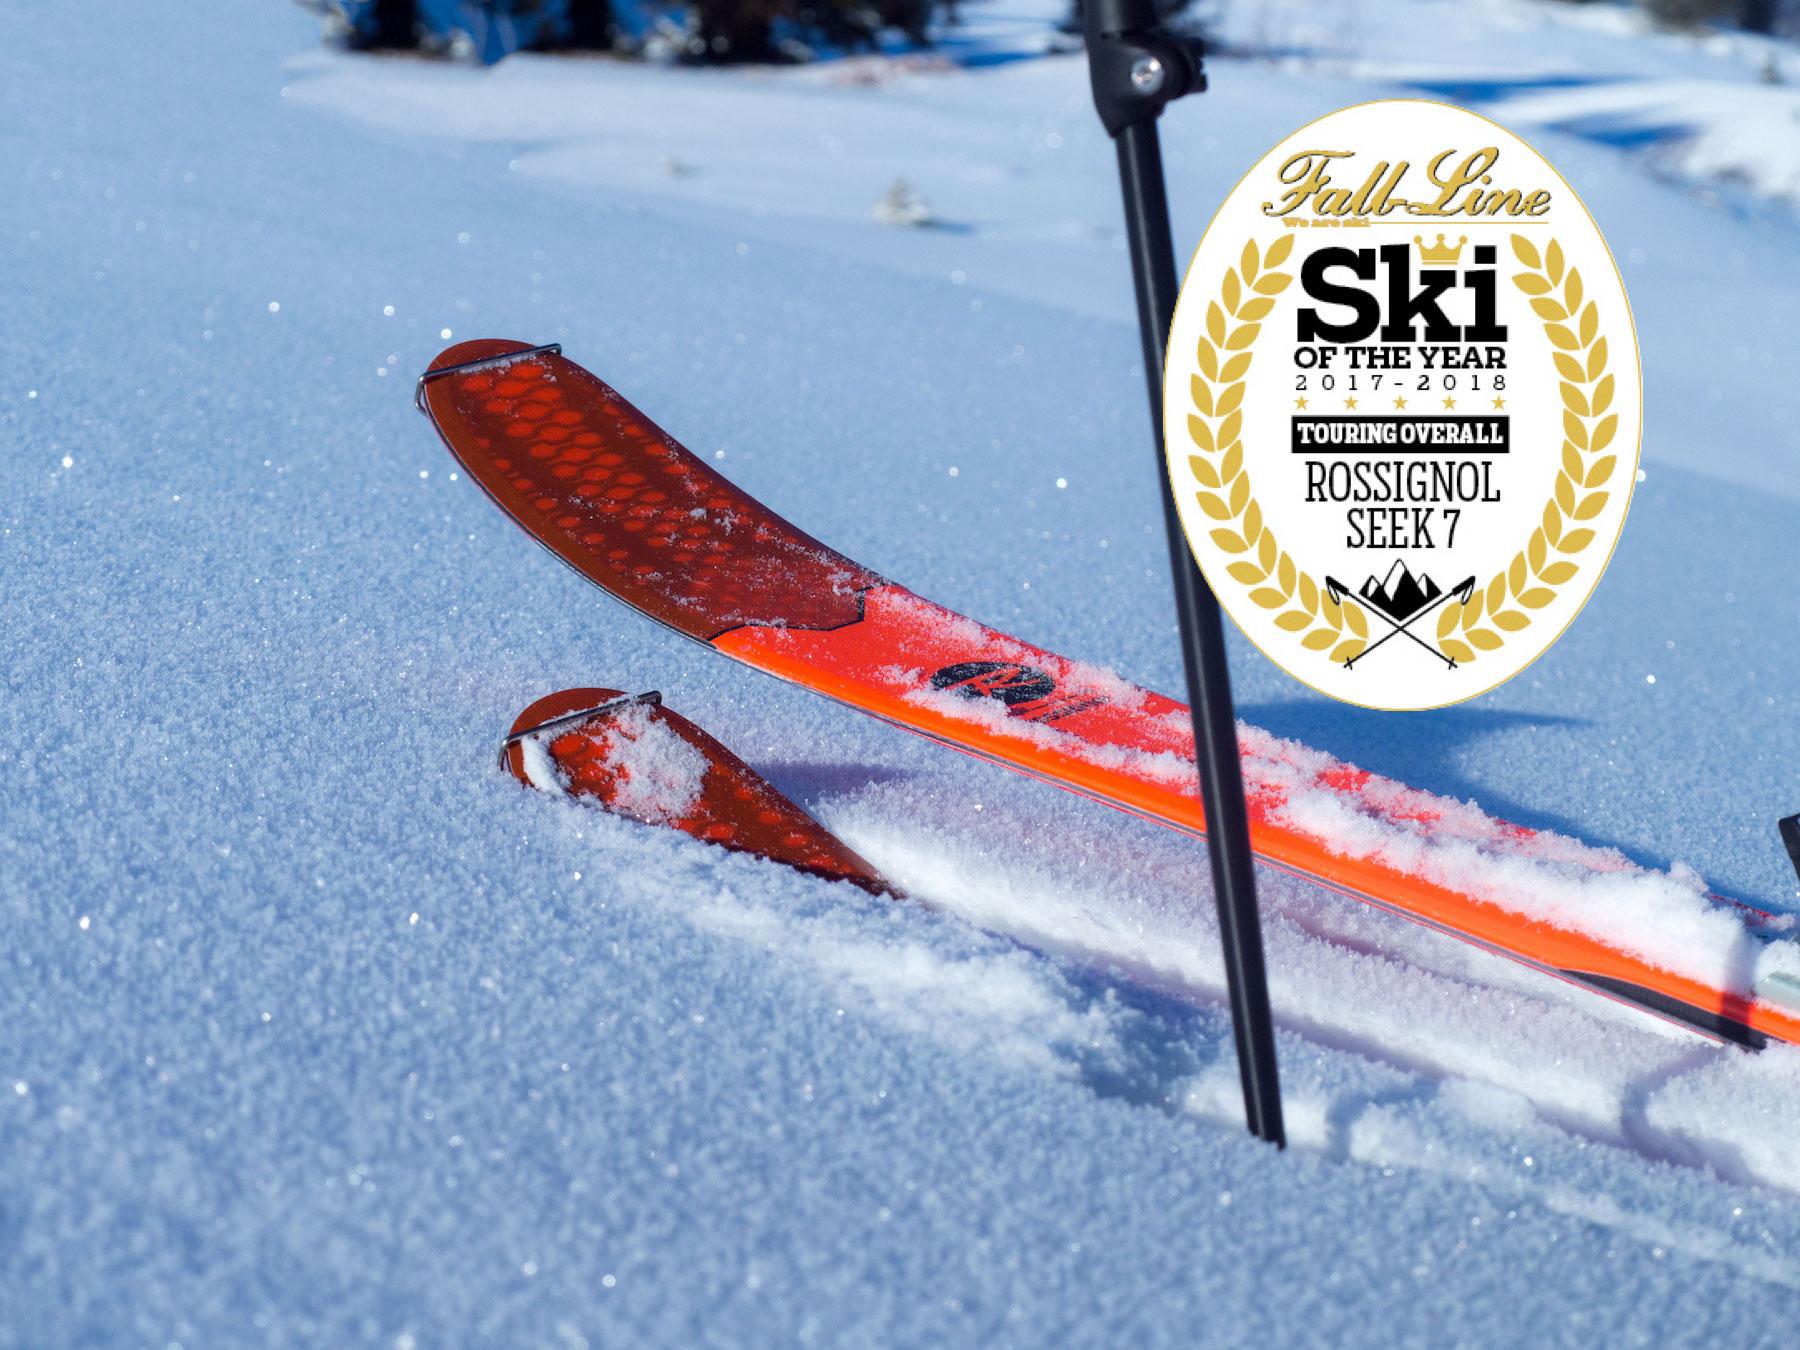 Rossignol Seek 7 wins Fall-Line Skiing magazine's best touring ski 2018 award